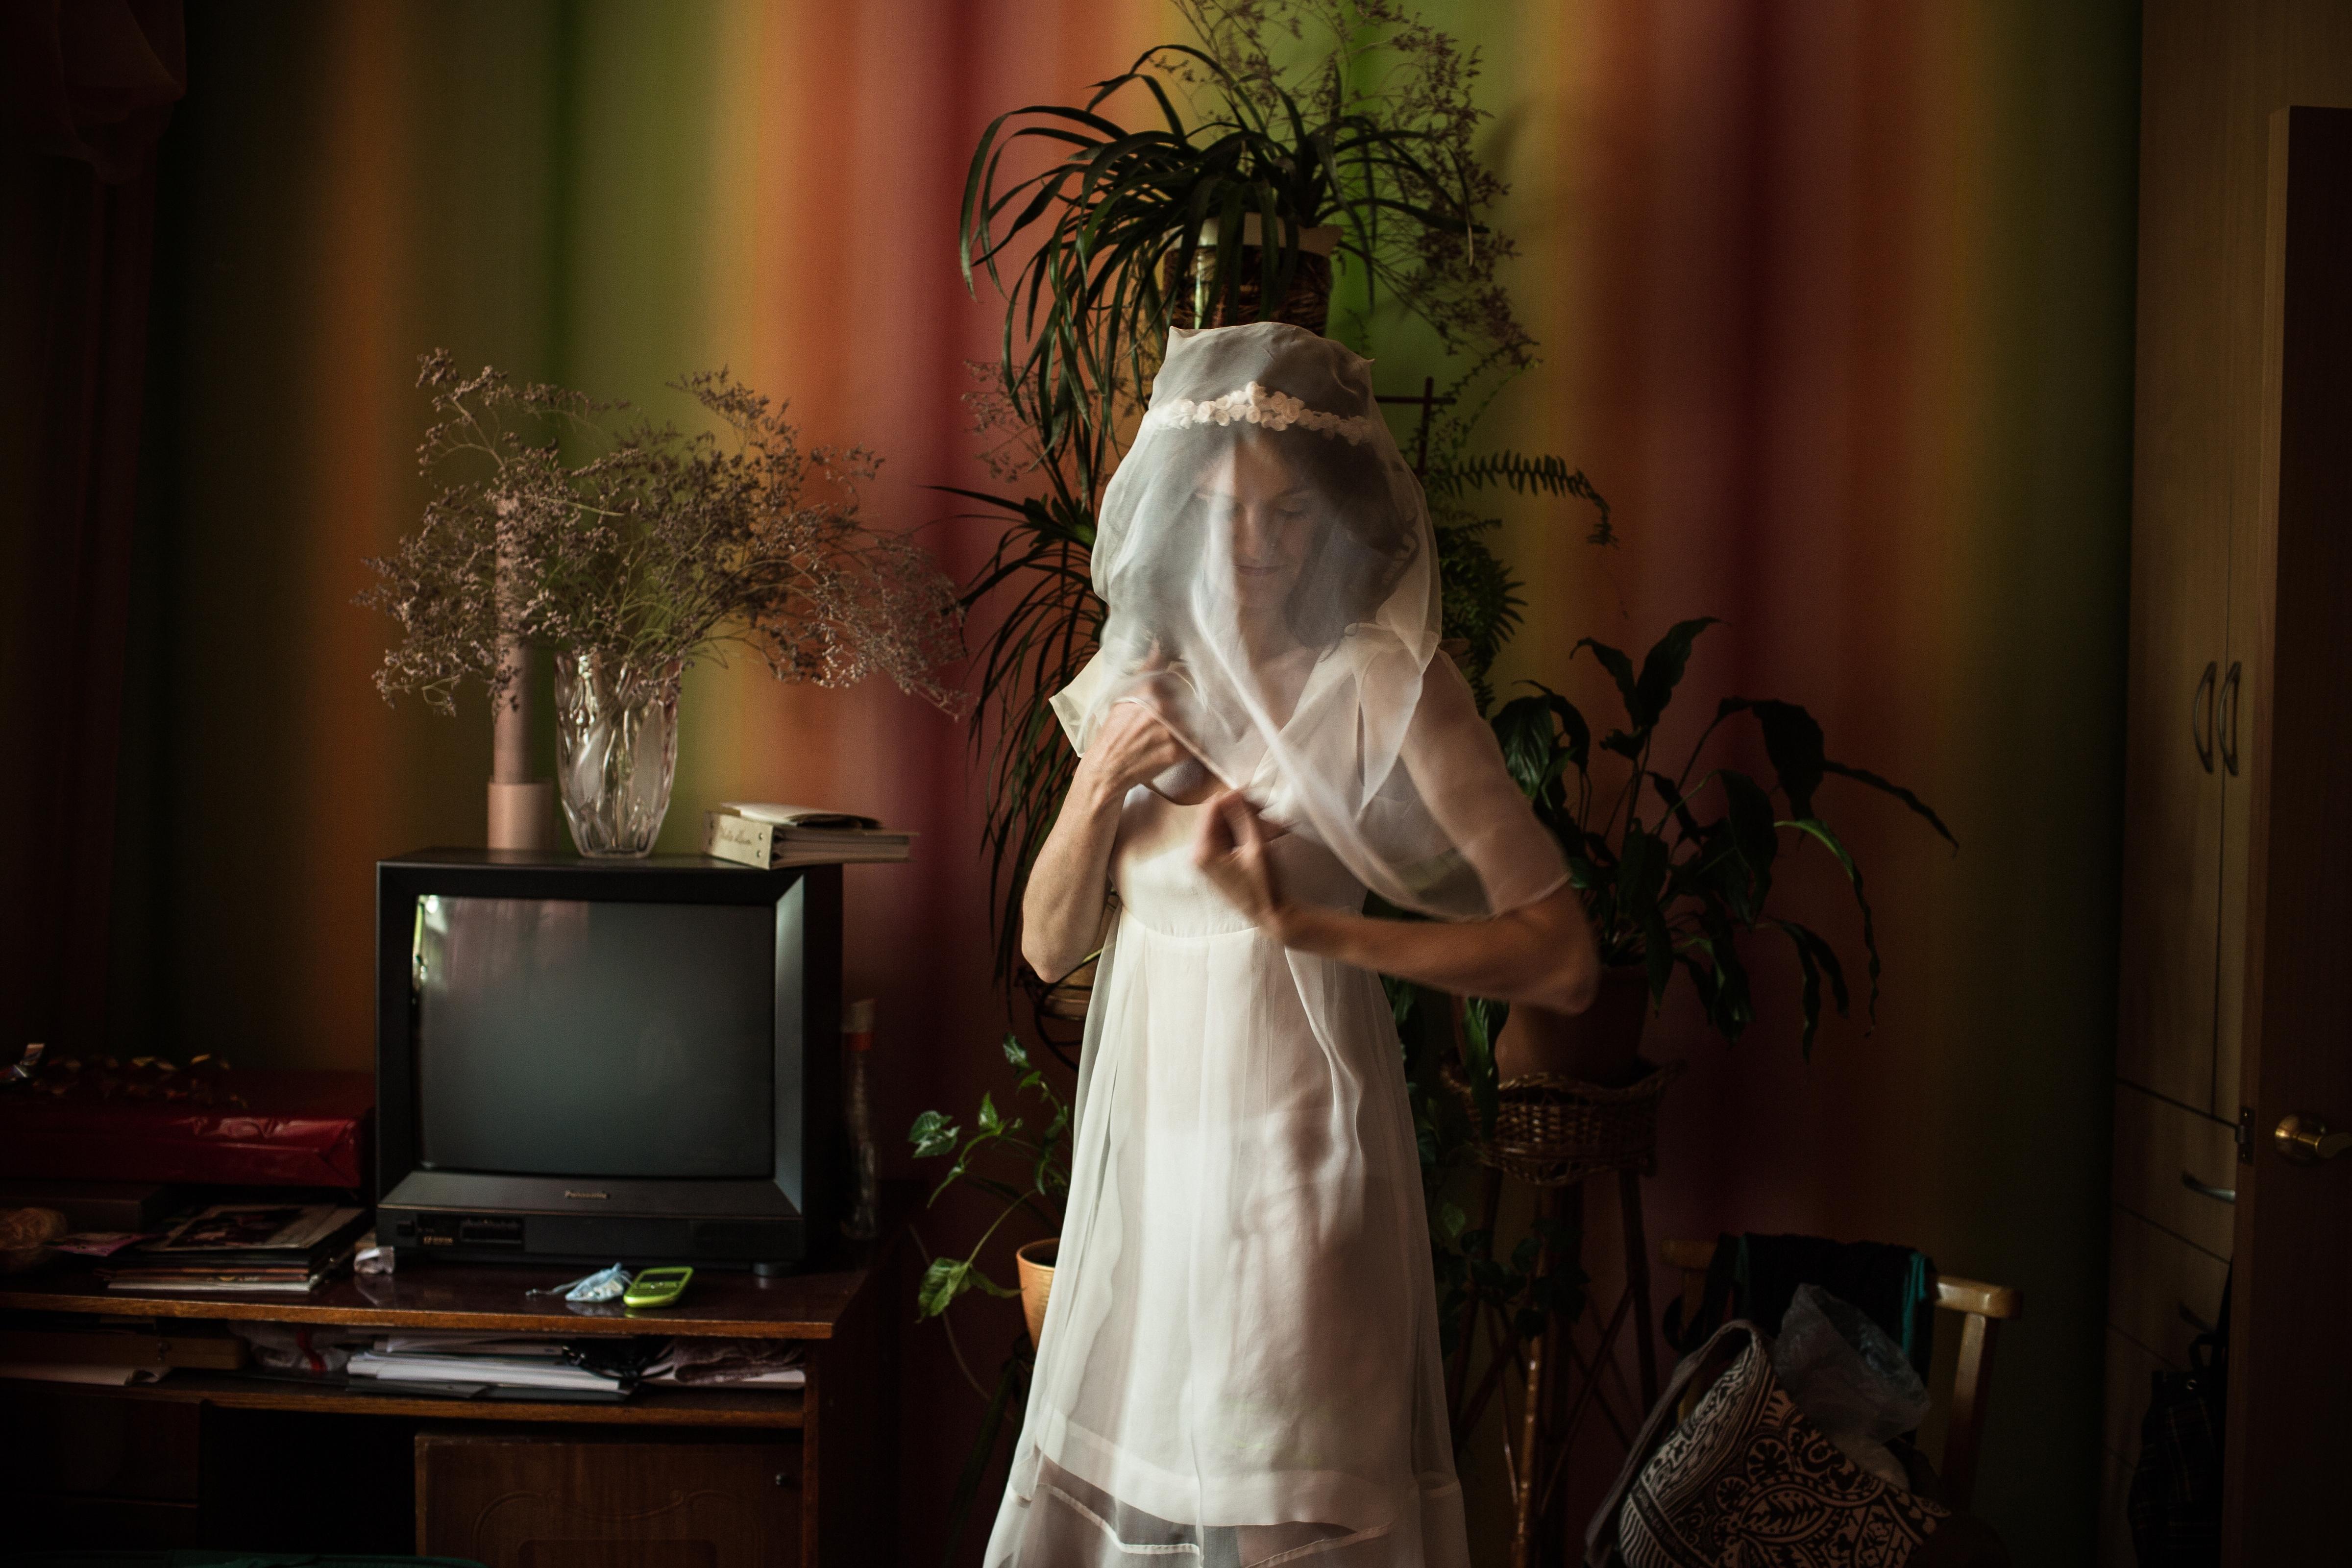 Yulia puts on her wedding dress in her room, on June 19 2013 in Slavutych, Ukraine.